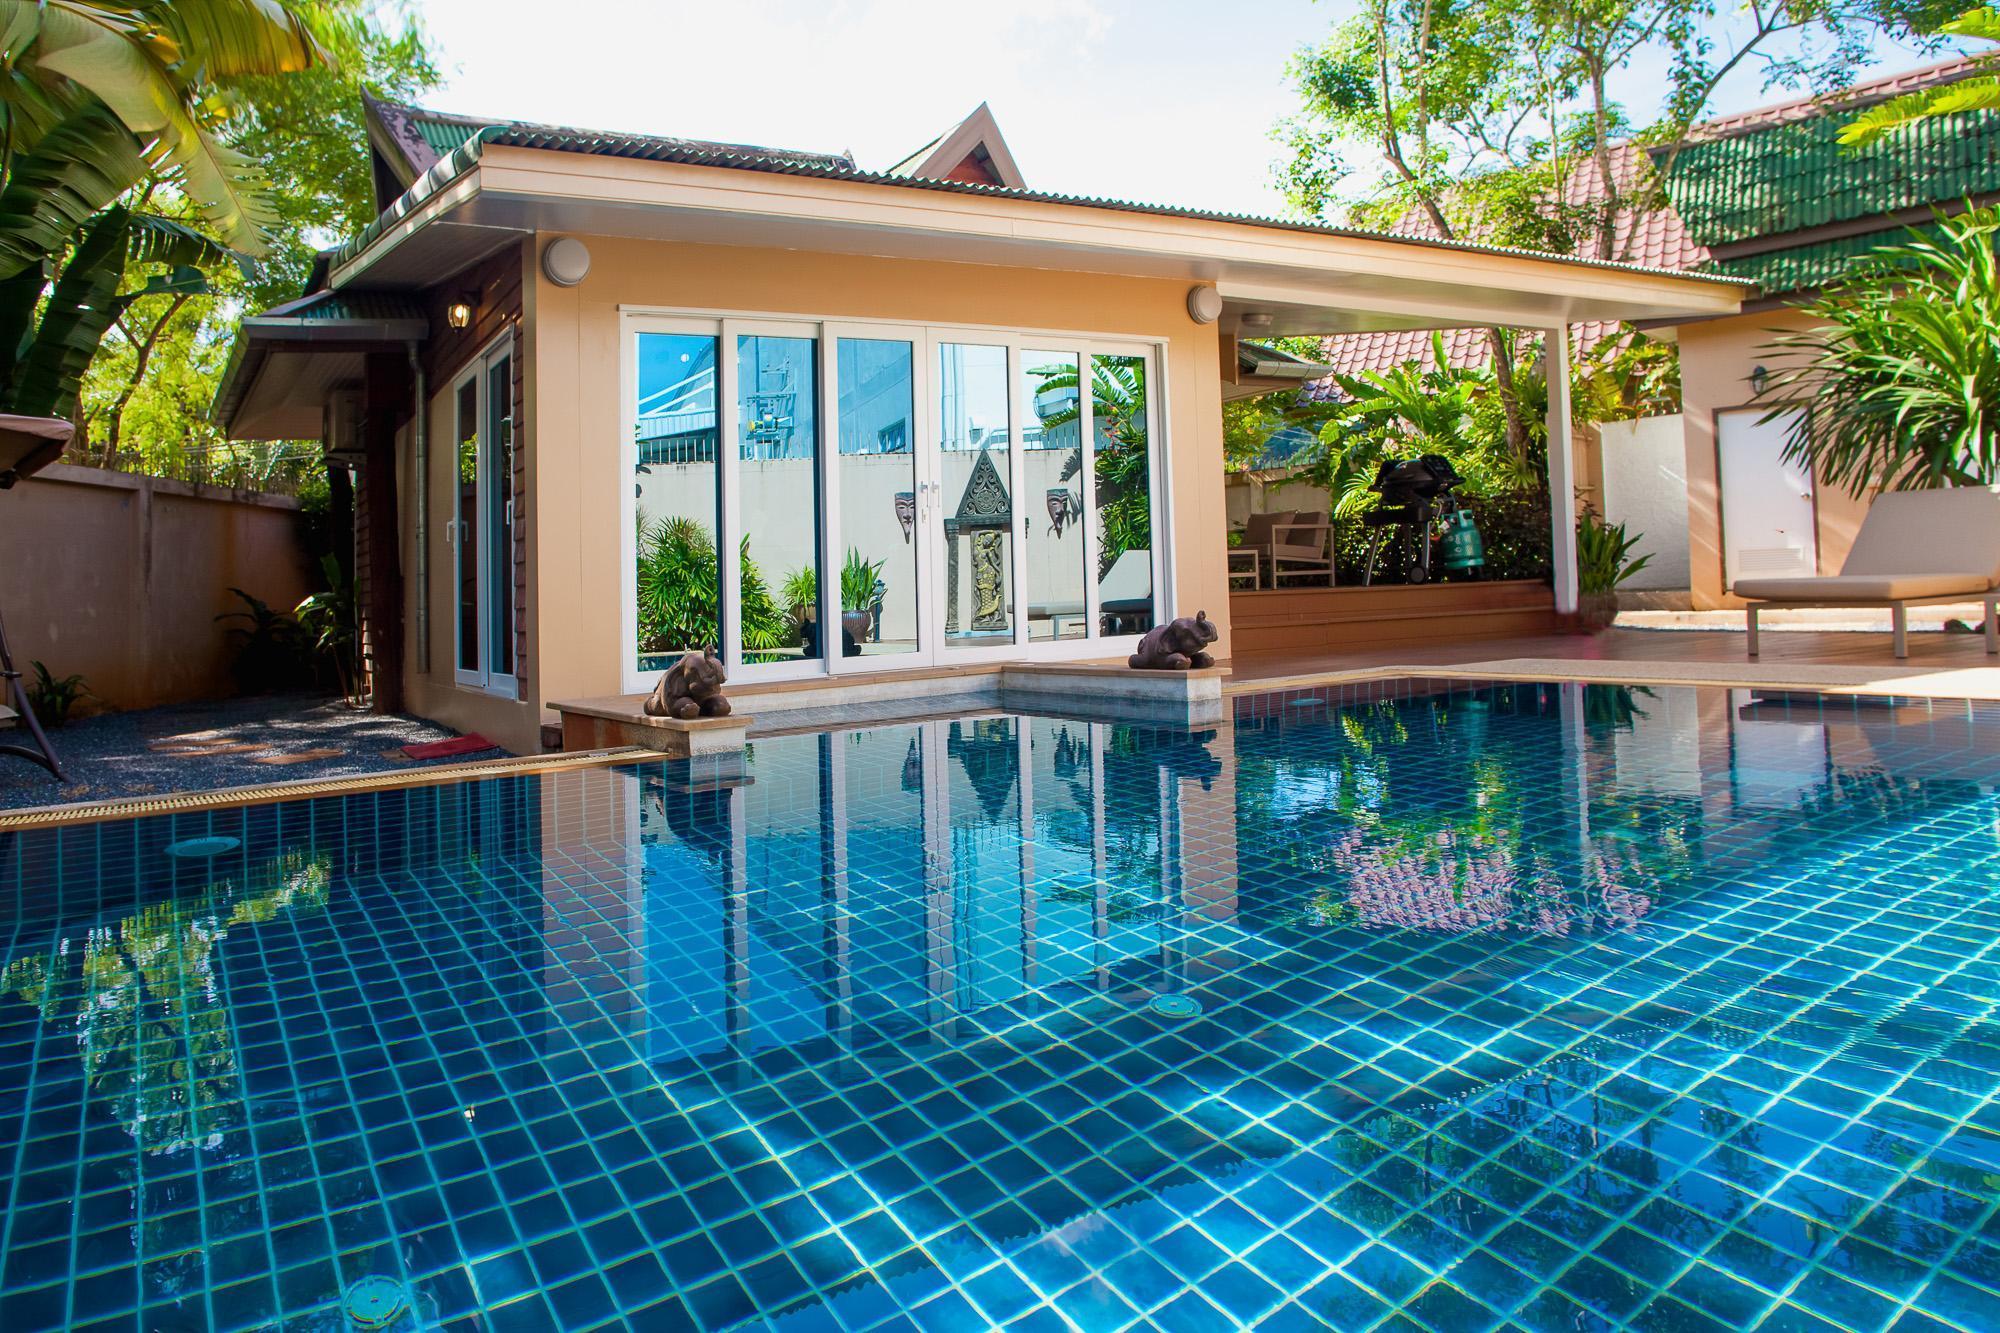 Baan Manu Chang Private Pool Villa บ้านมนูช้าง ไพรเวทพูล วิลลา